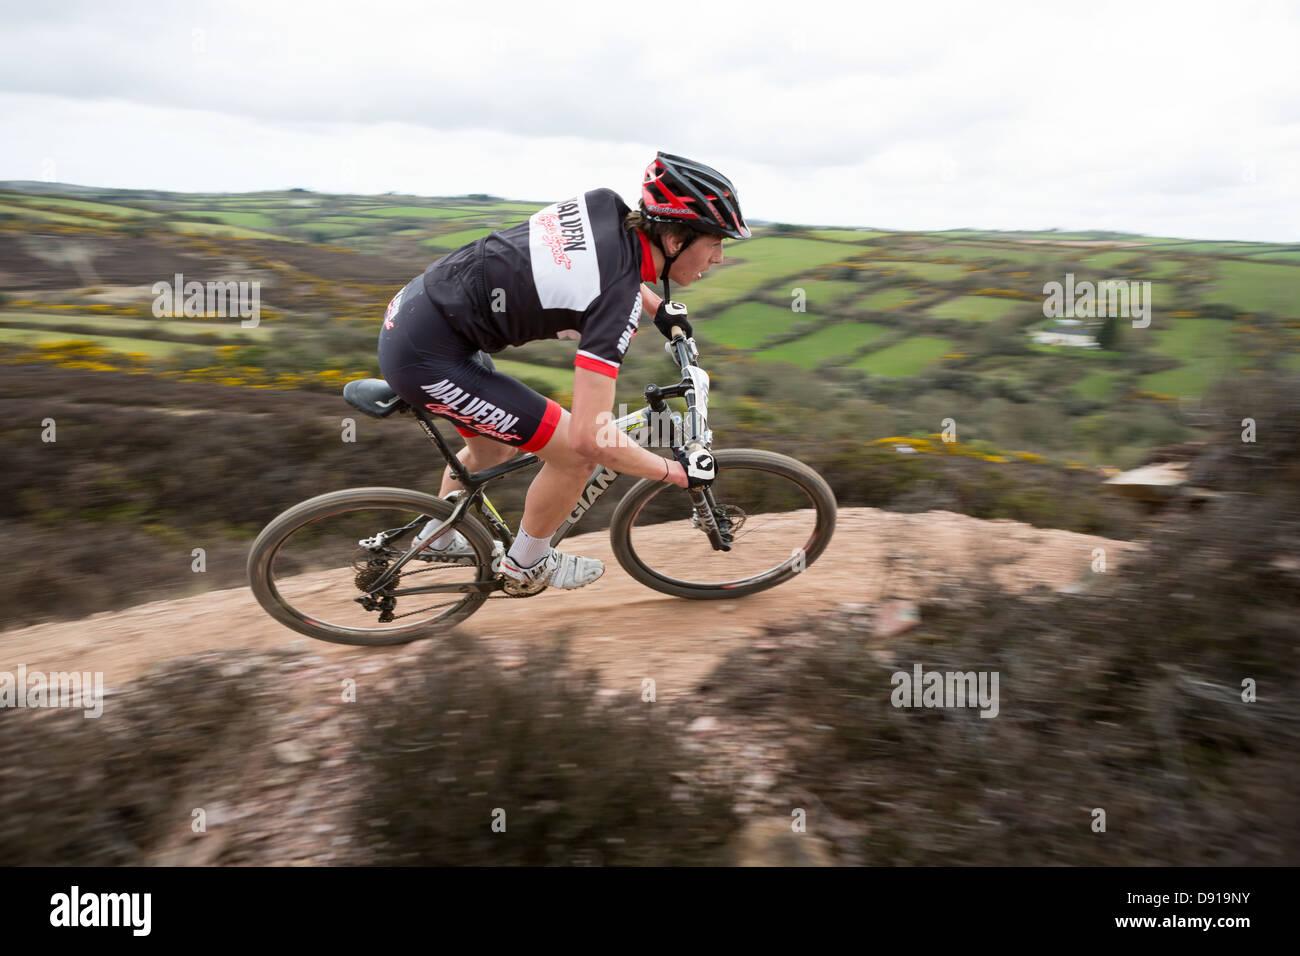 WHEAL MAYD VALLEY, REDRUTH, UK. British XC Series Round 2, mountain bike cross country race. Blurred background - Stock Image